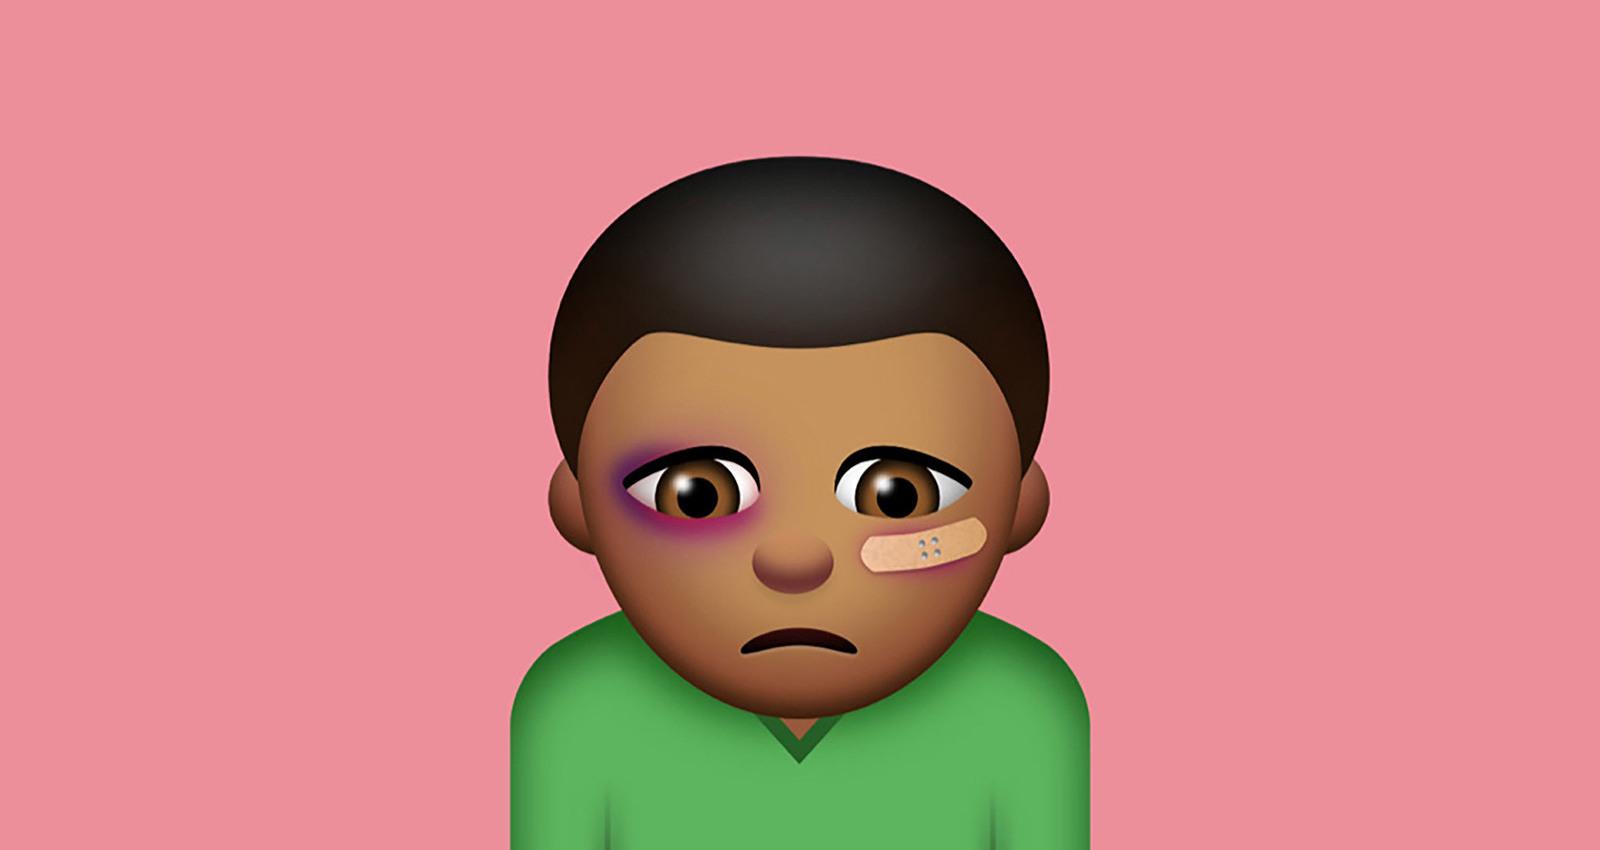 Abused Emojis